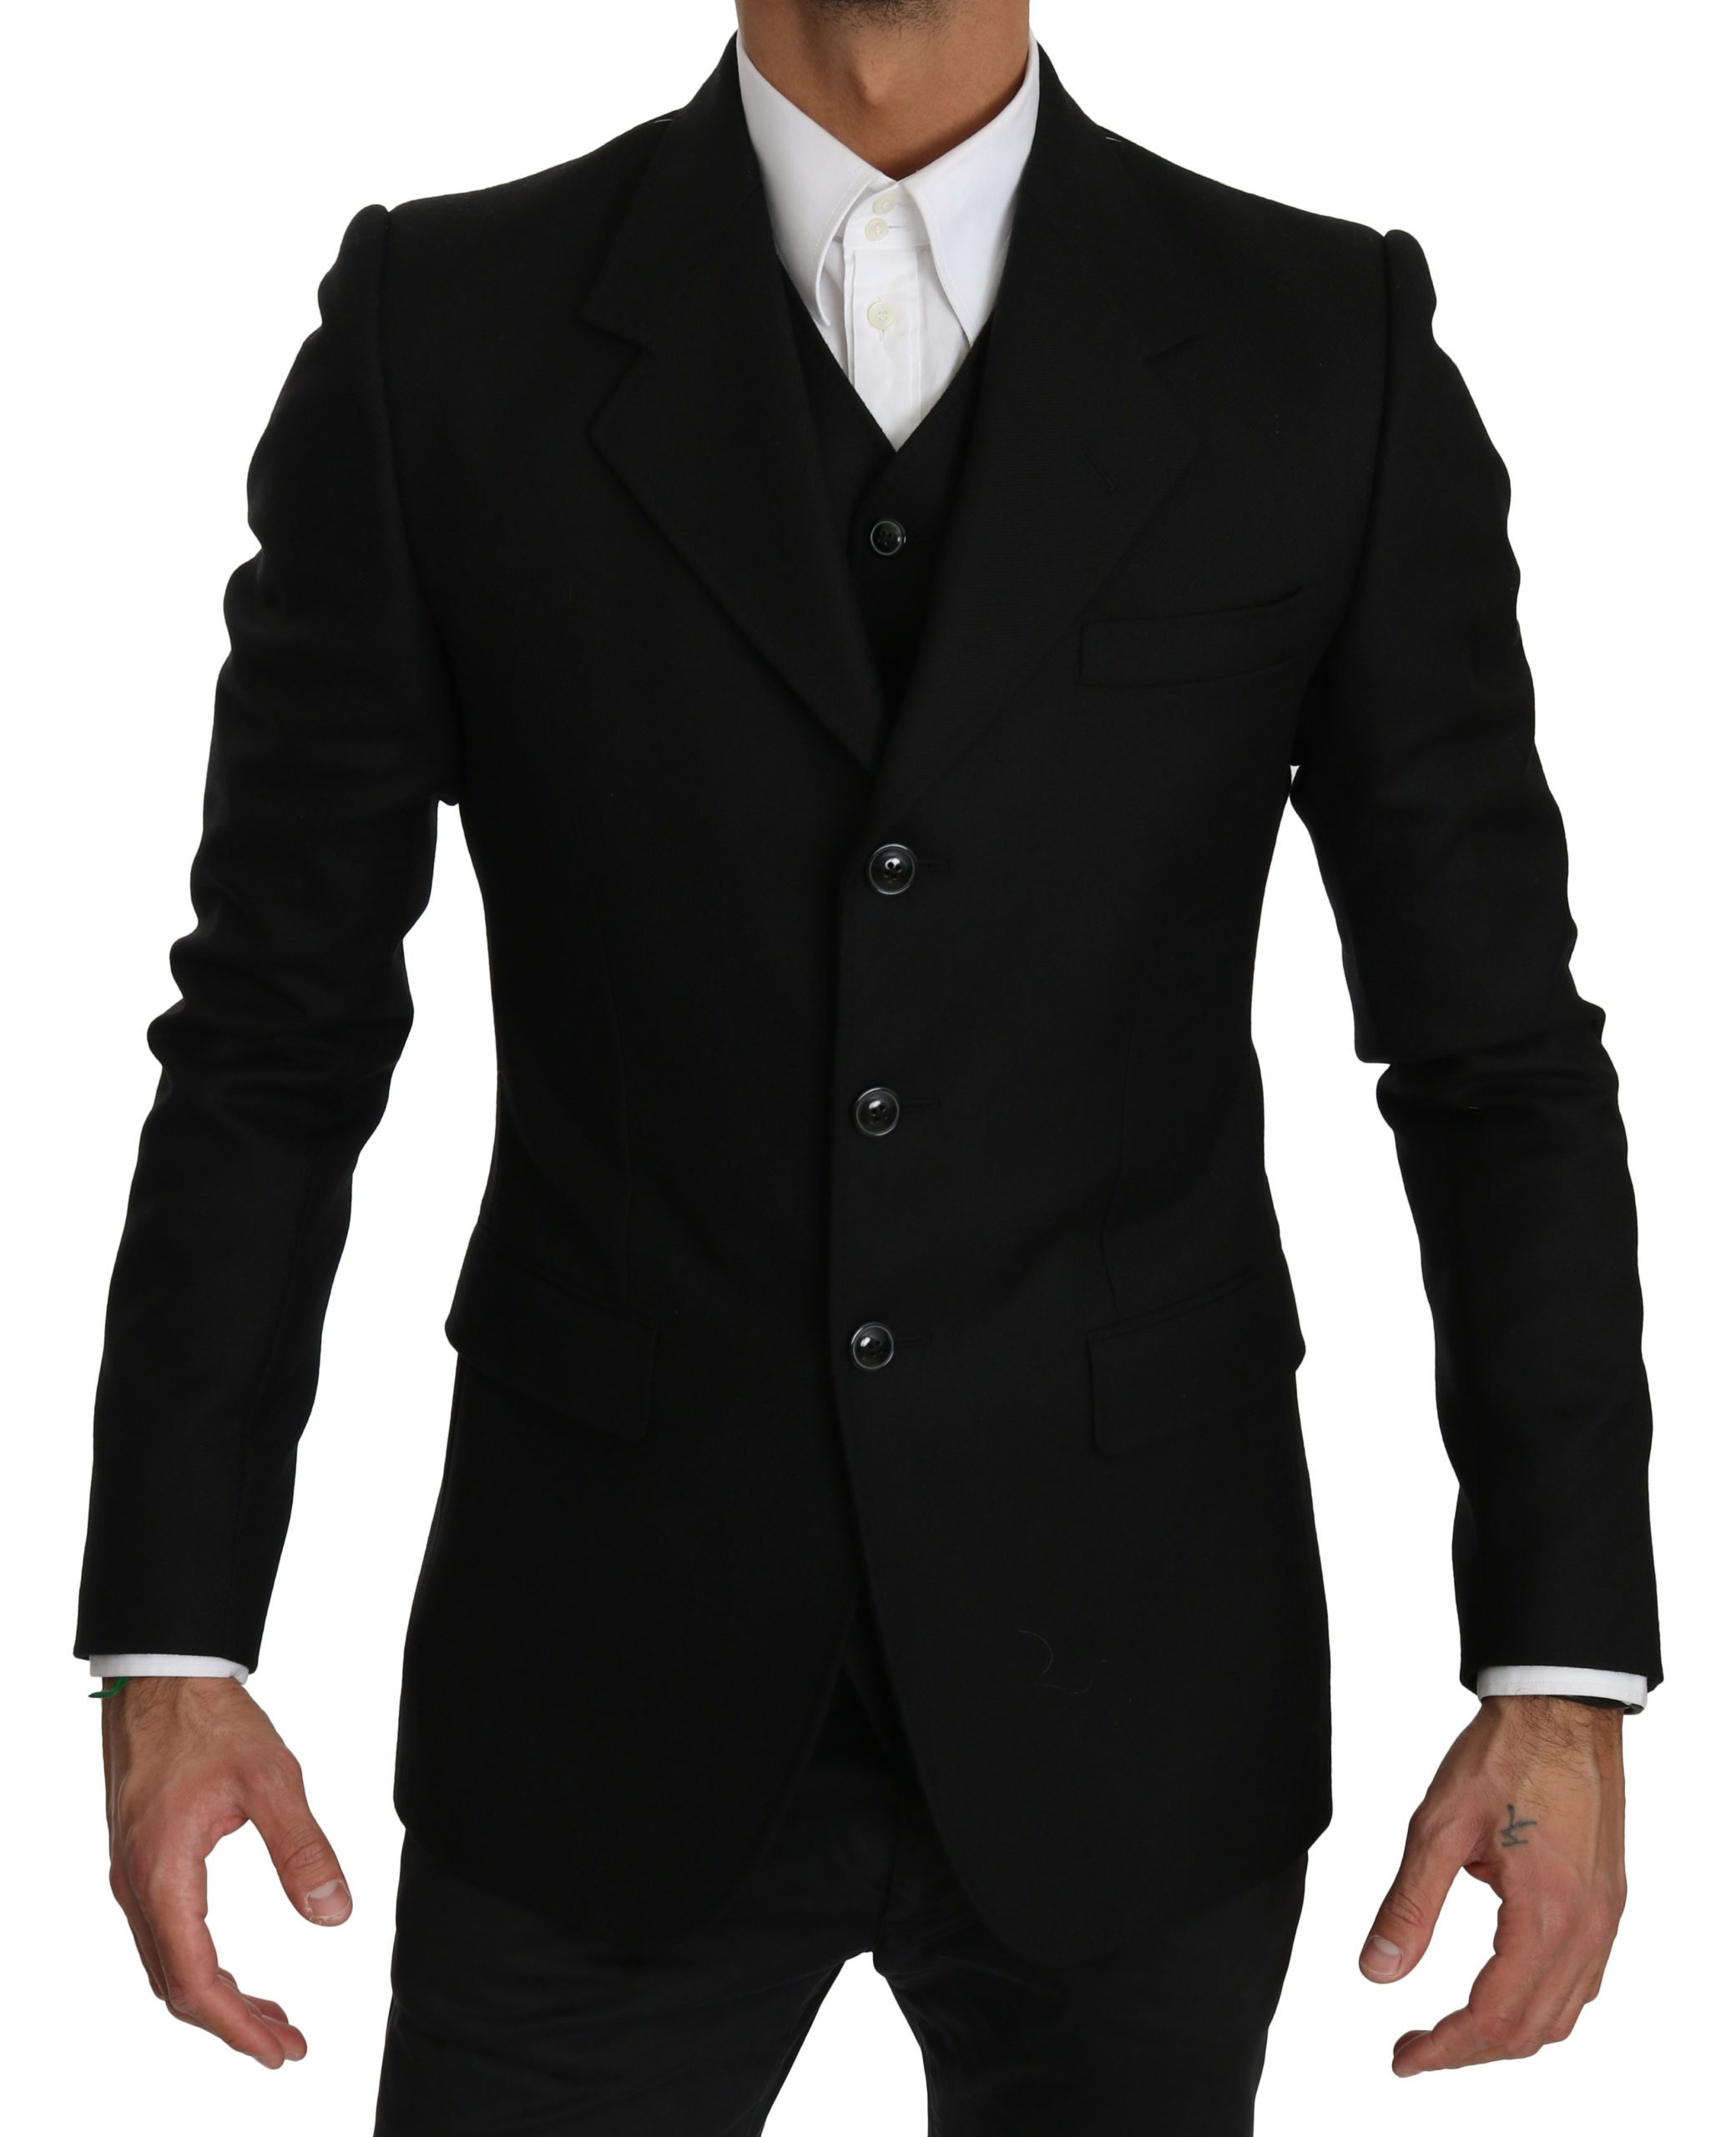 Dolce & Gabbana Men's Wool Two Piece Vest Jacket Blazer Black KOS1604 - IT48   M